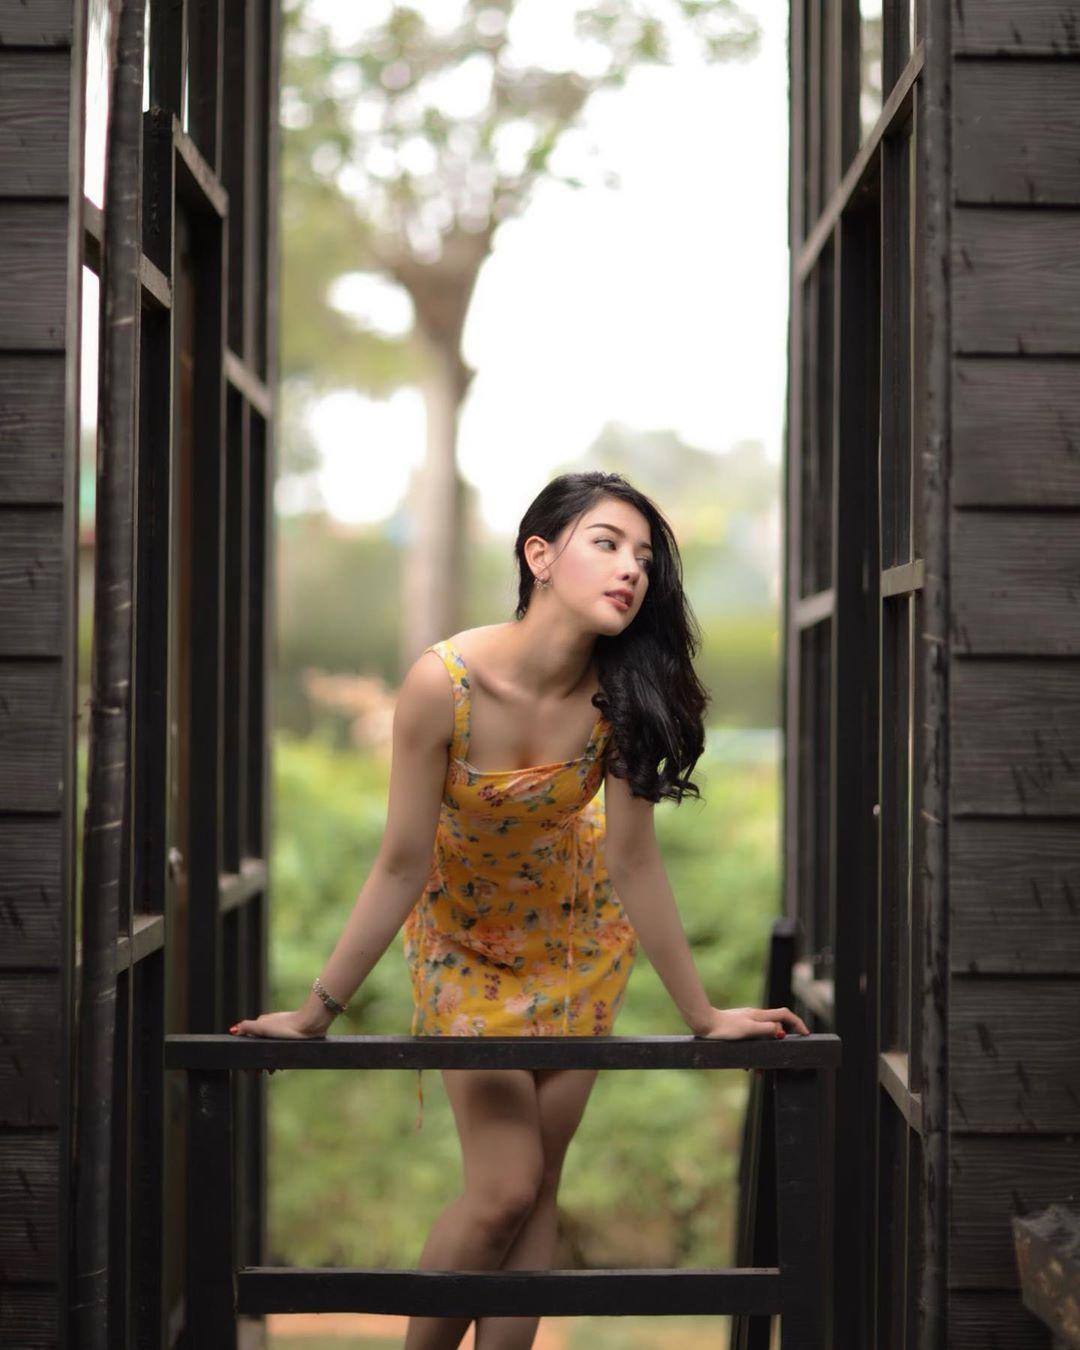 Kunci Akun, Ini Gaya Seksi Siwi Sidi Pramugari Viral Garuda Indonesia